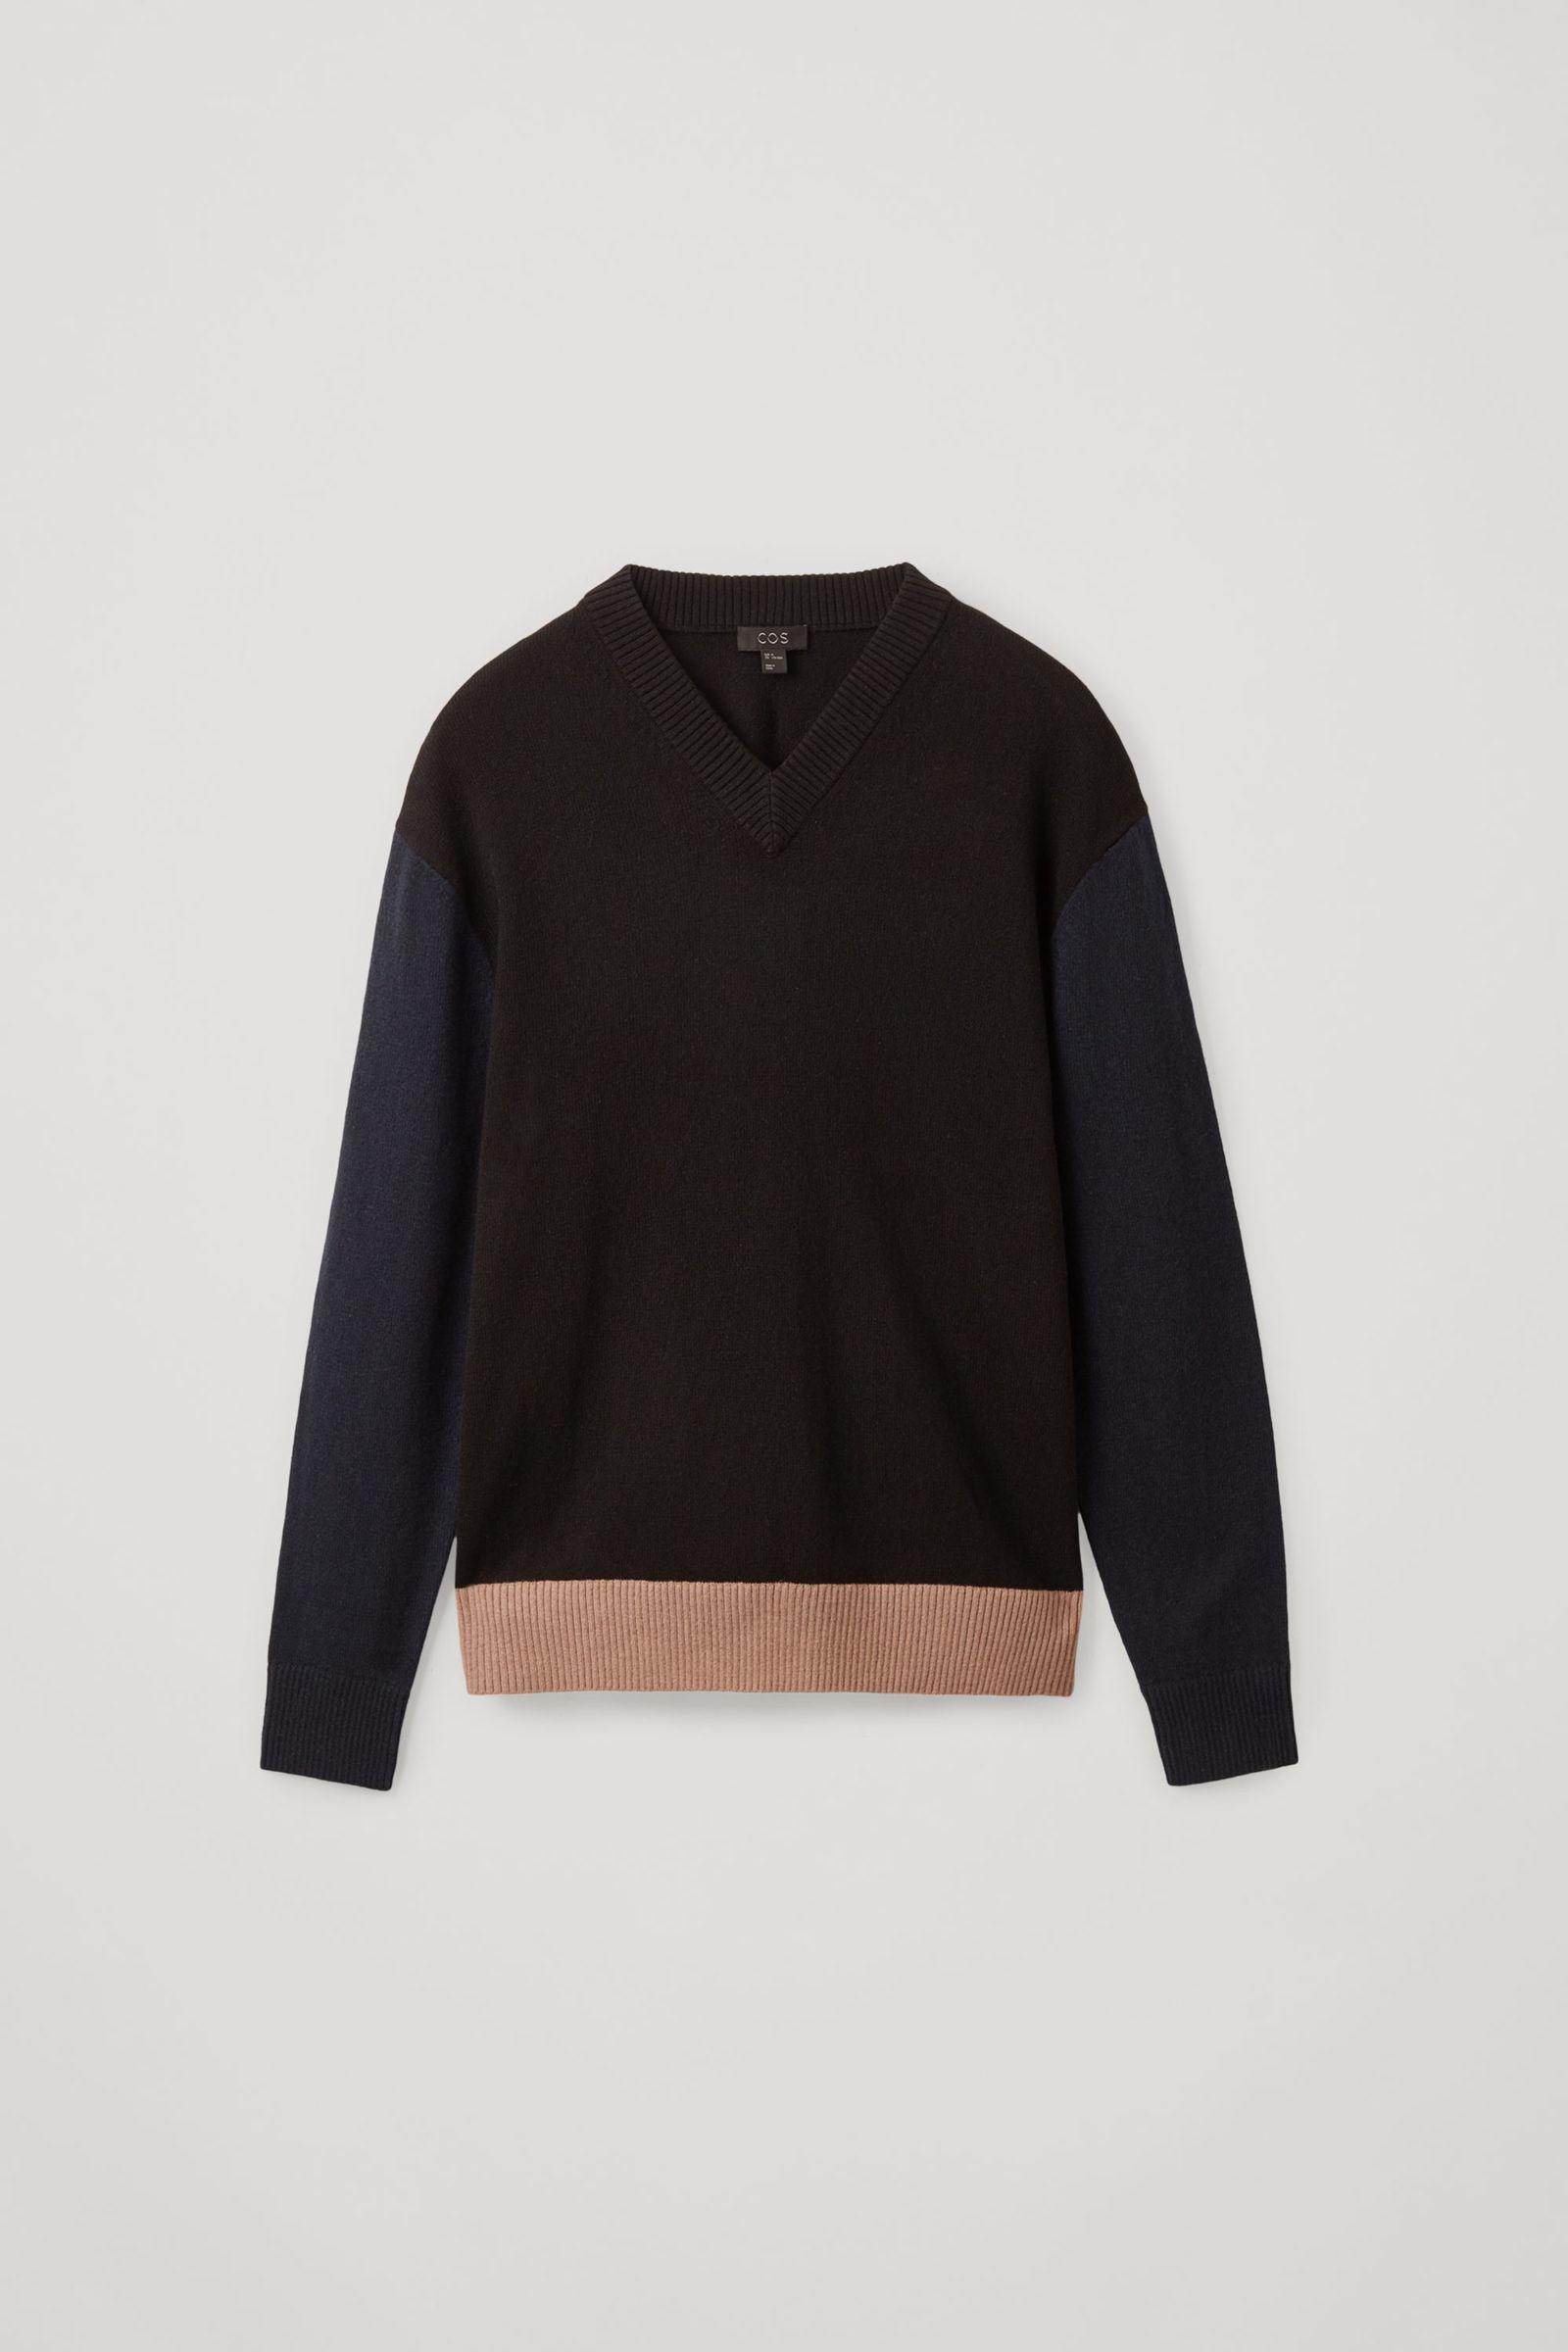 COS 컬러 블록 울 코튼 스웨터의 브라운 / 네이비 / 블랙컬러 Product입니다.